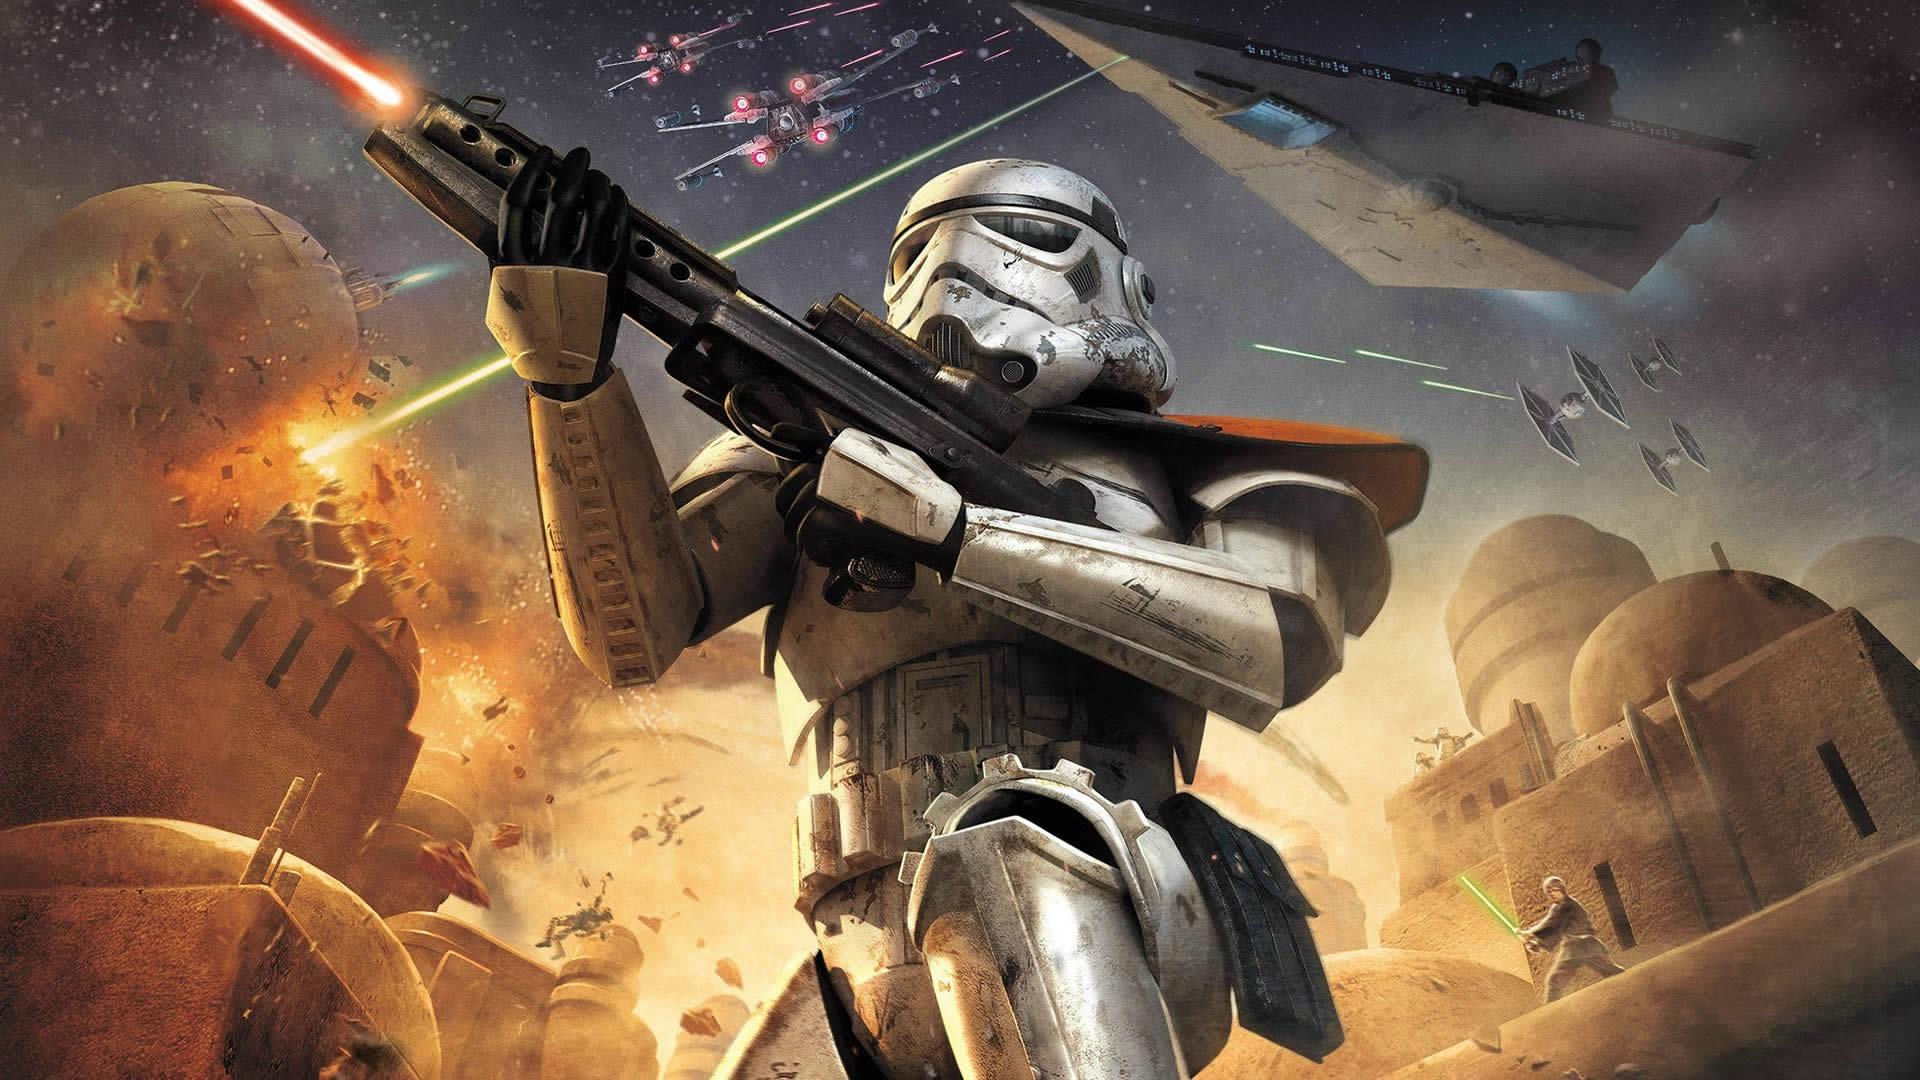 wallpaper star wars digital art gun video games